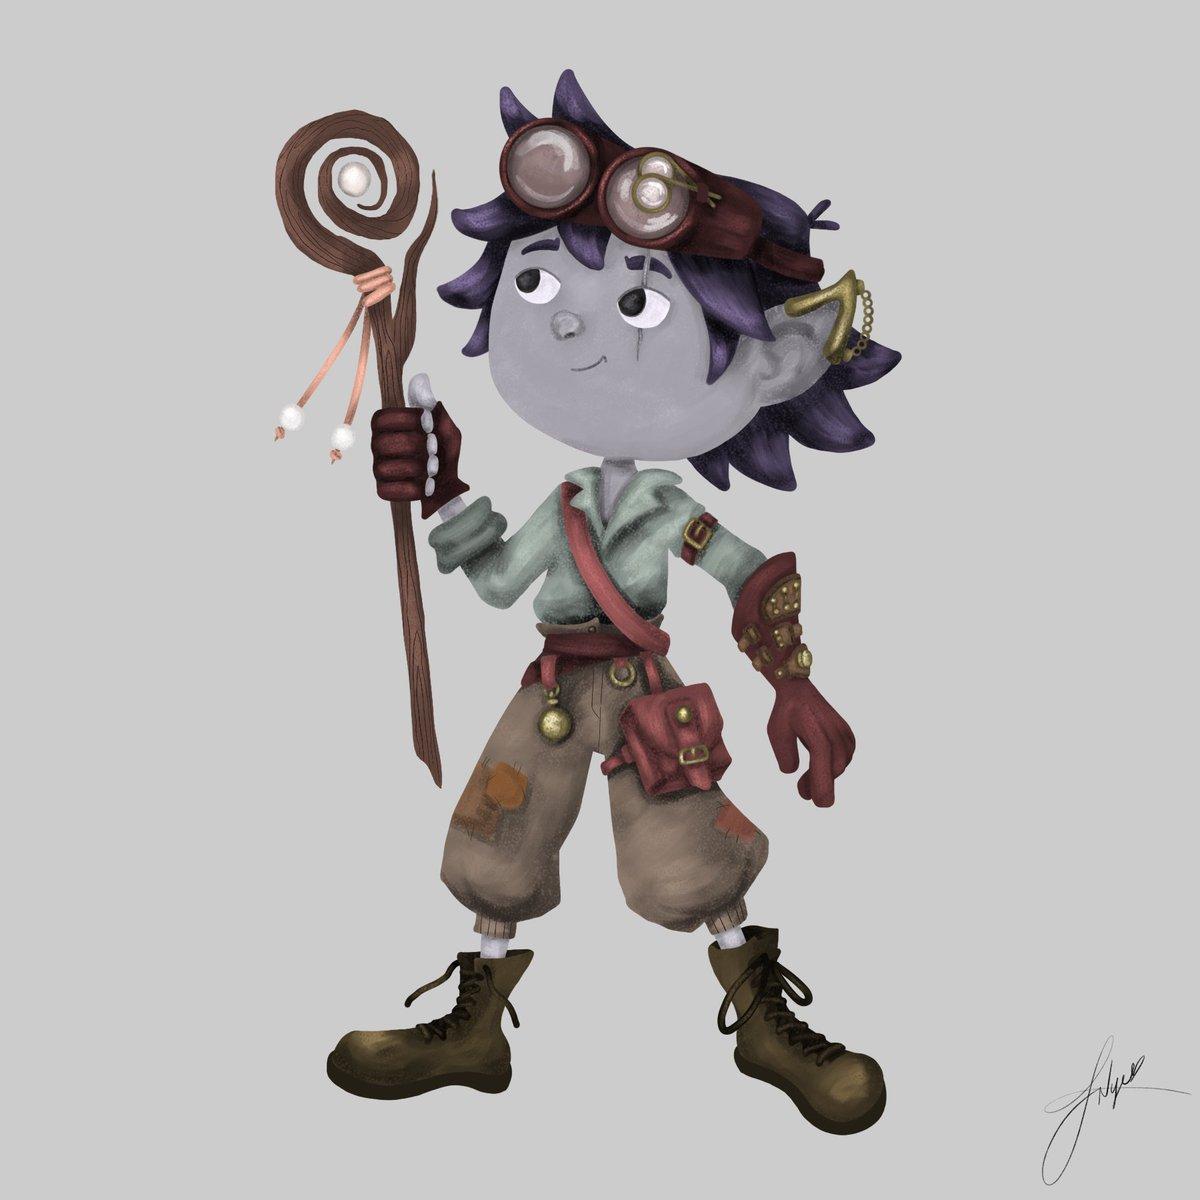 #Artwork Awesome of the Day: #Steampunk ⚙️ Character #Illustration 🖼️ By Illustrator & Vis Dev @jadoodle_noodle #SamaArt